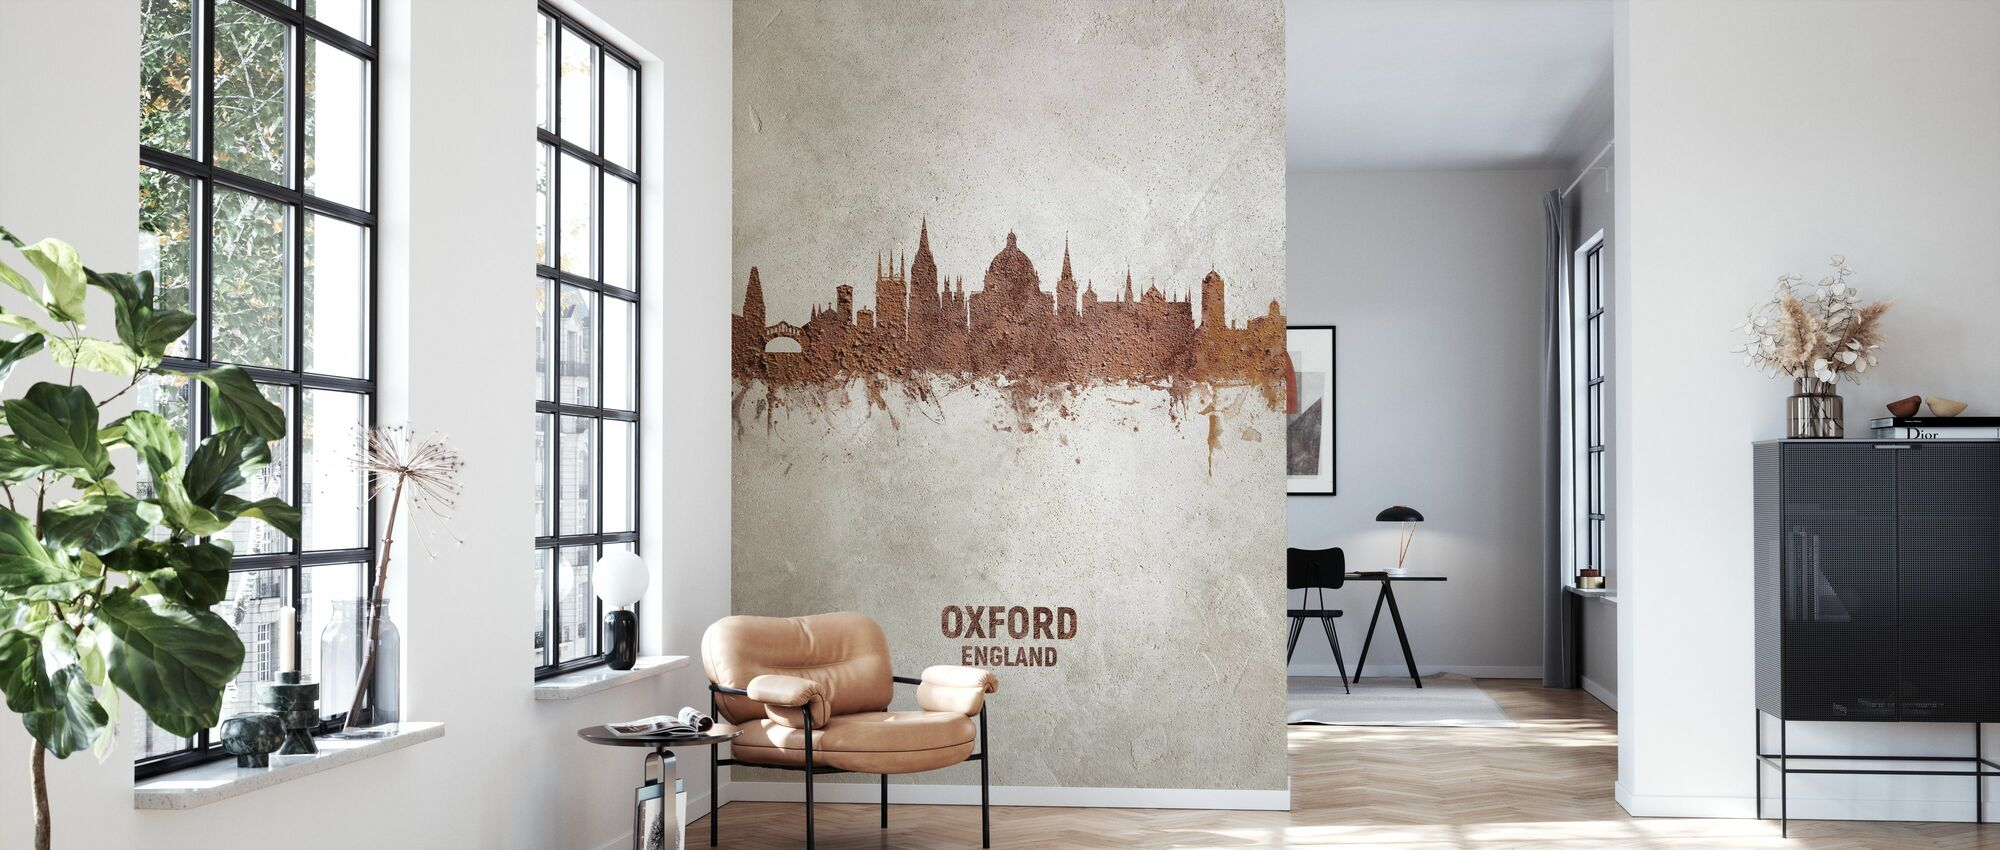 Oxford England Rust Skyline - Wallpaper - Living Room